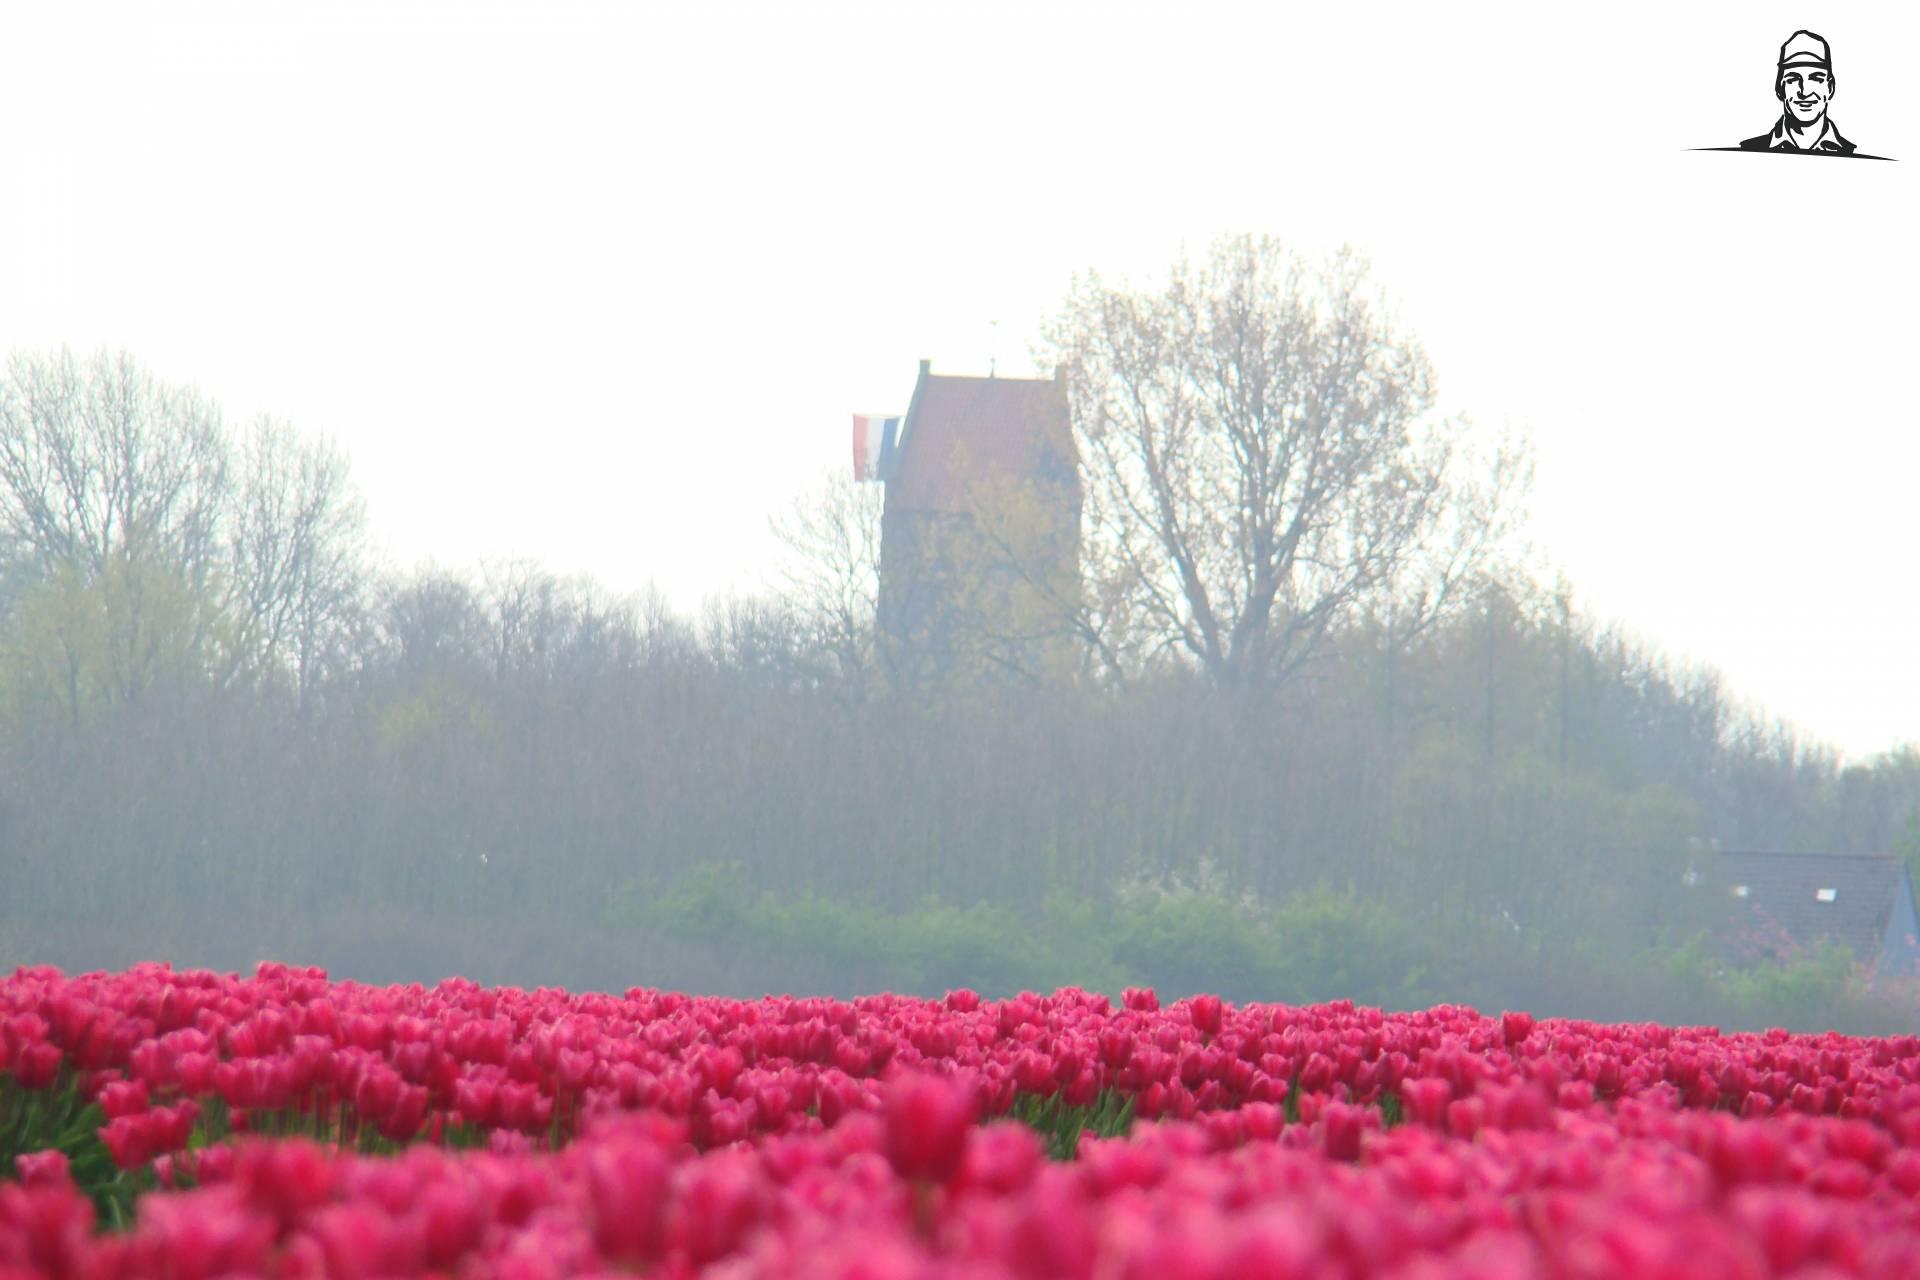 Tulpen op koninginnedag van Johndeeretje